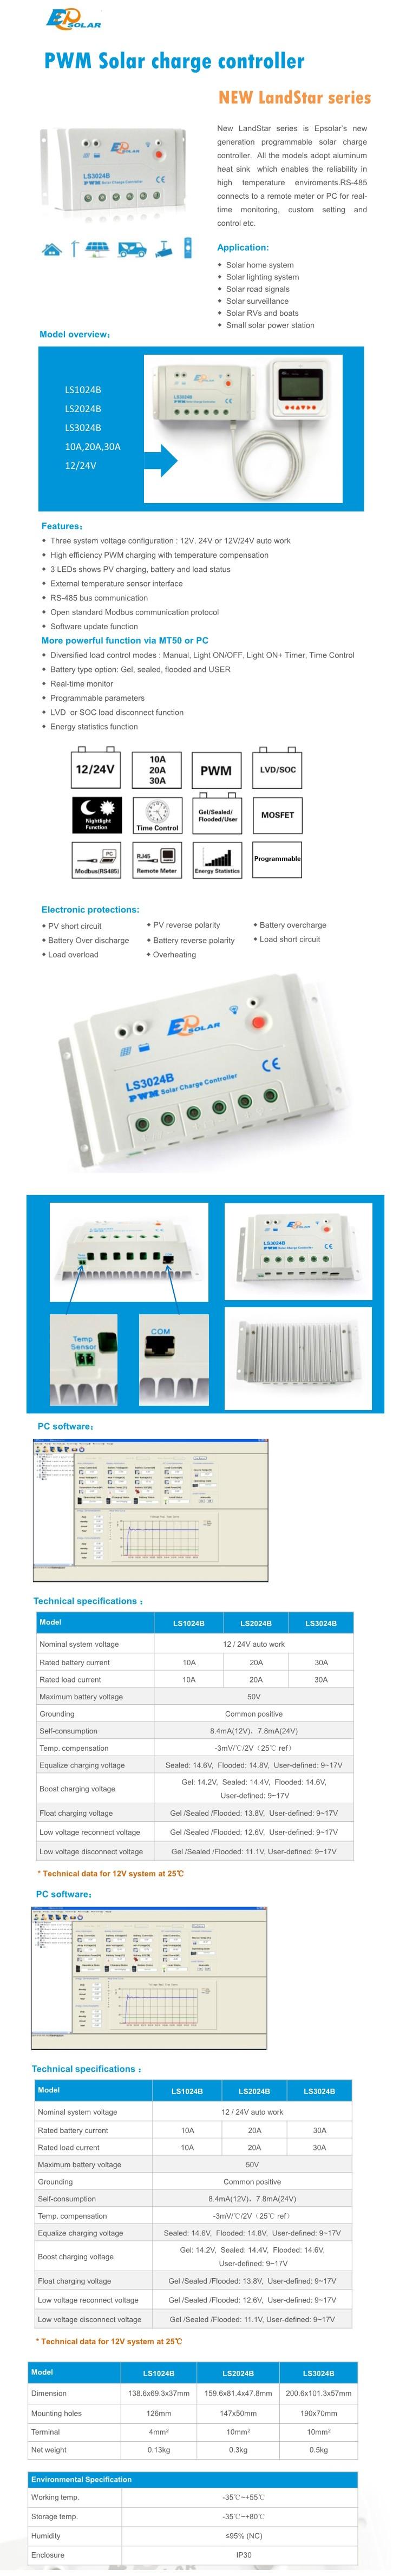 Epsolar Ls3024b 30a 12v 24v Ep Landstar Solar Charge Controller Circuit Regulator Epever